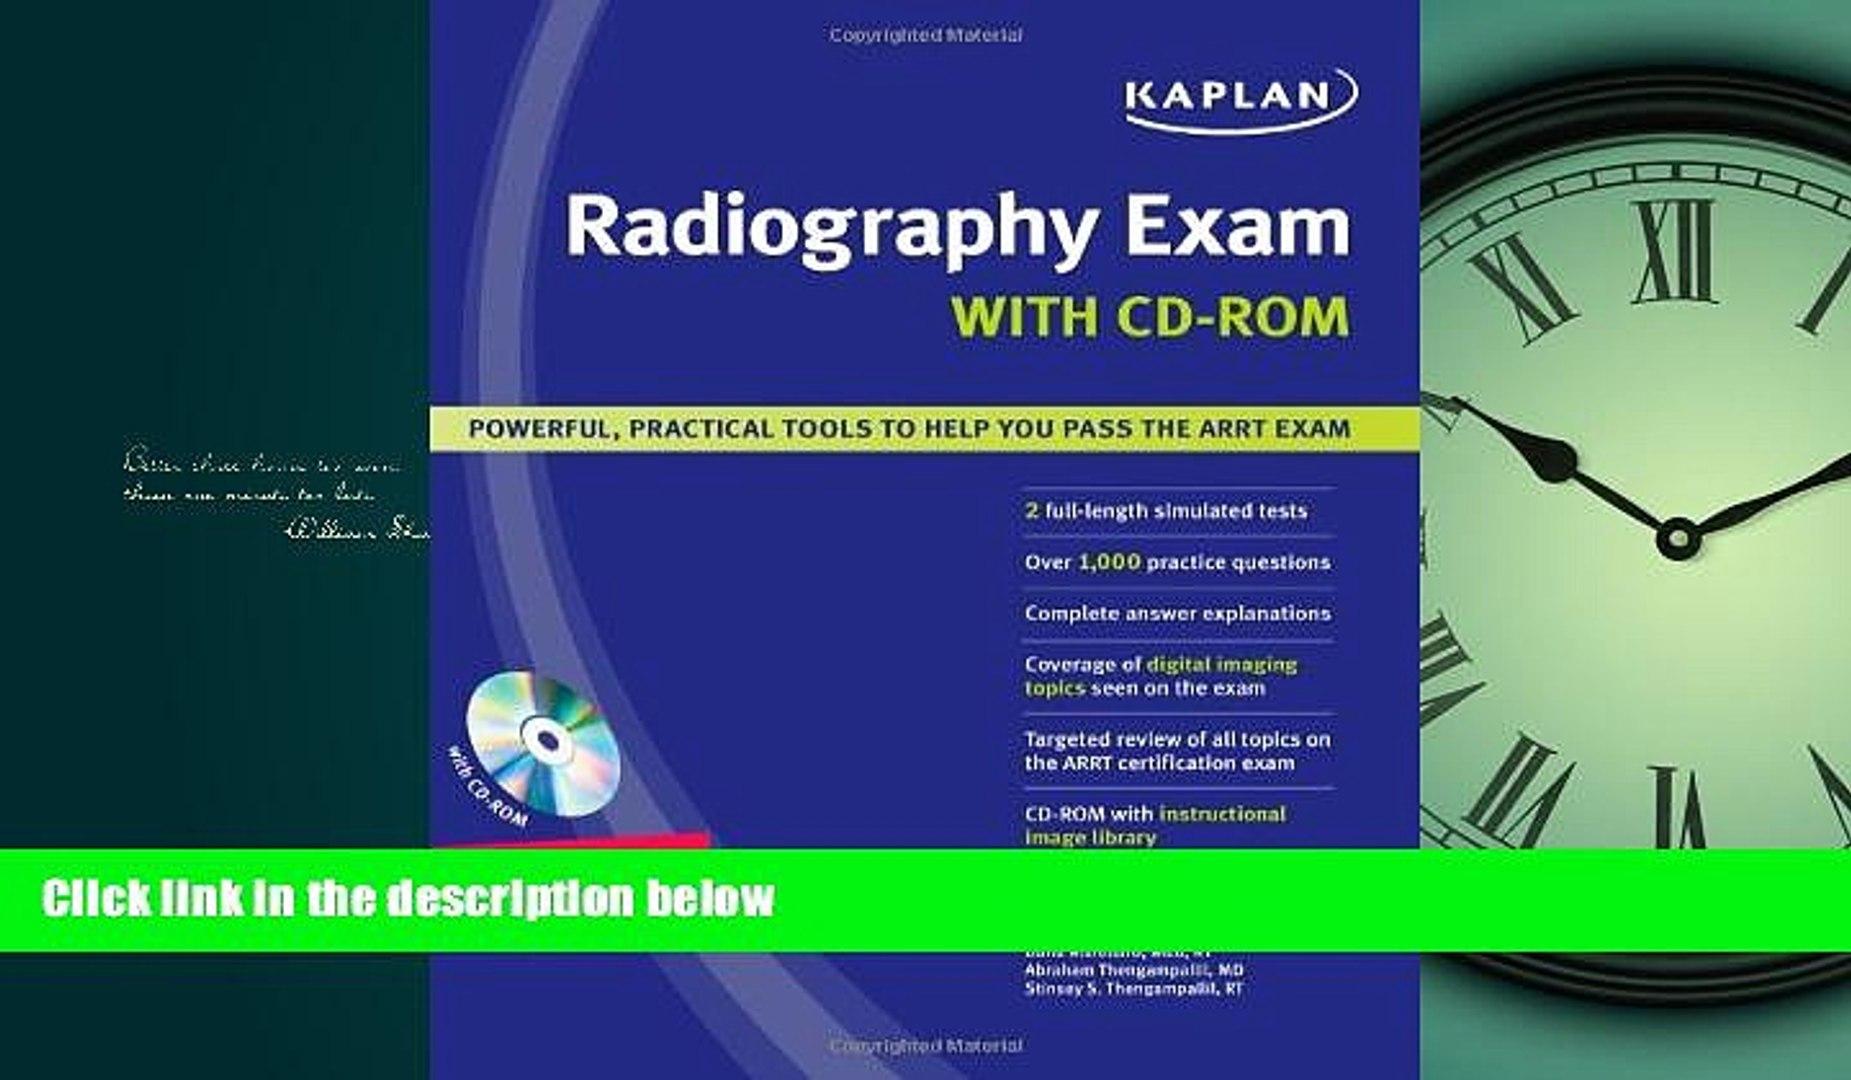 Popular Book Kaplan Radiography Exam with CD-ROM